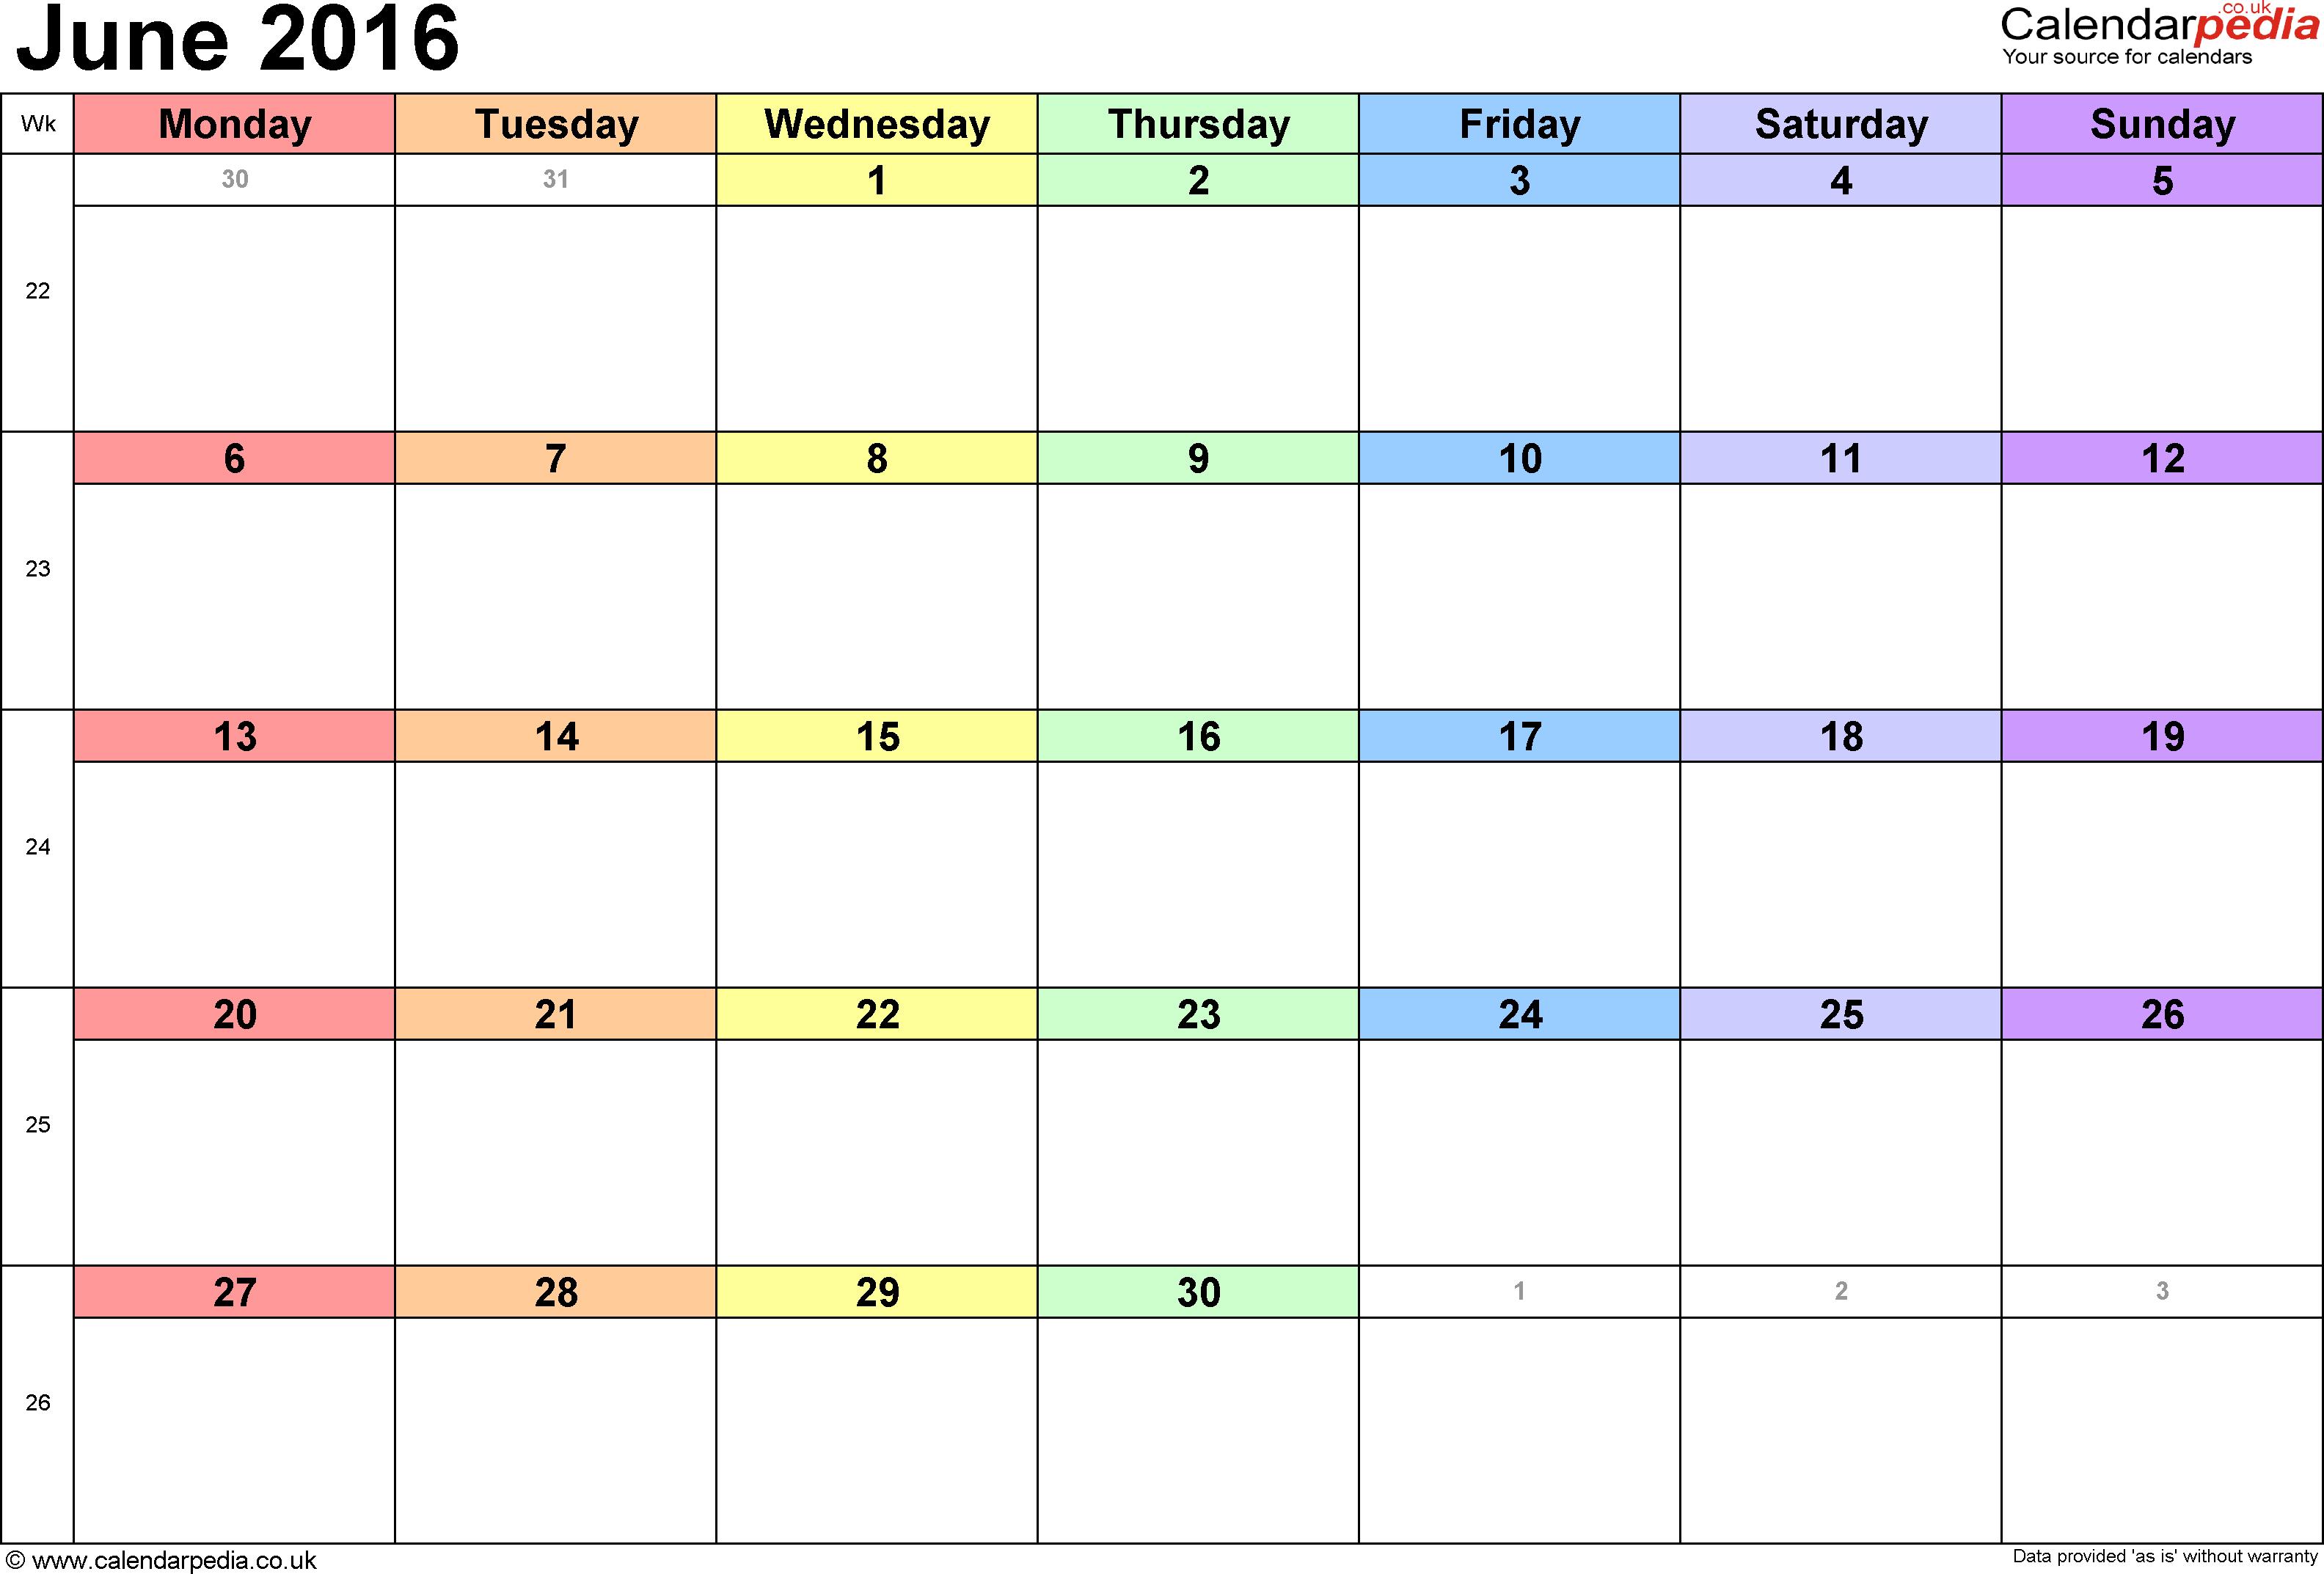 Calendar June 2016 UK, Bank Holidays, Excel/PDF/Word Templates